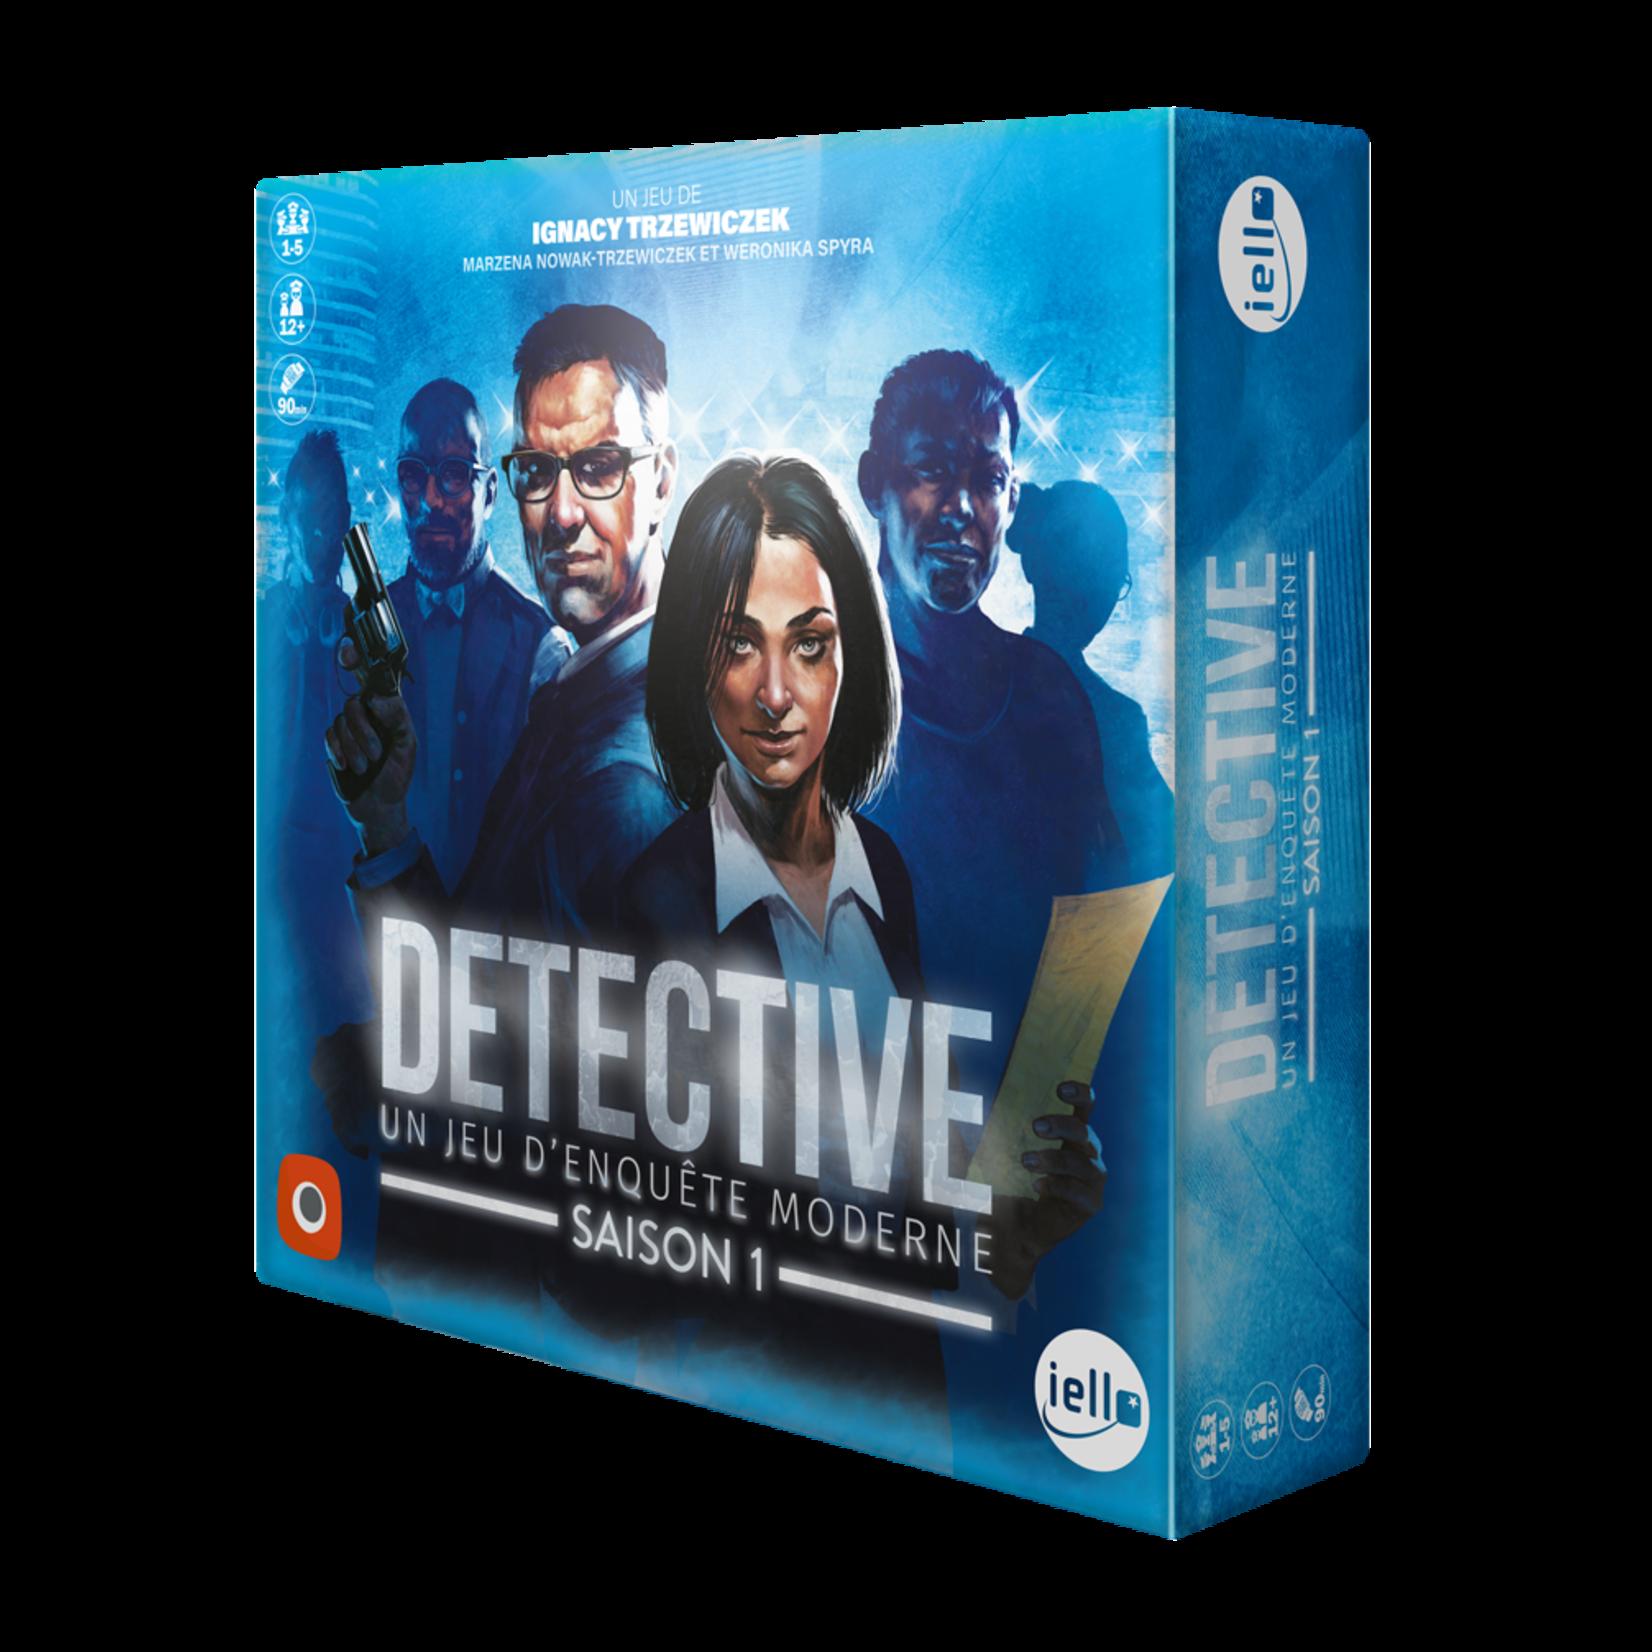 Iello Detective Saison 1 (French)